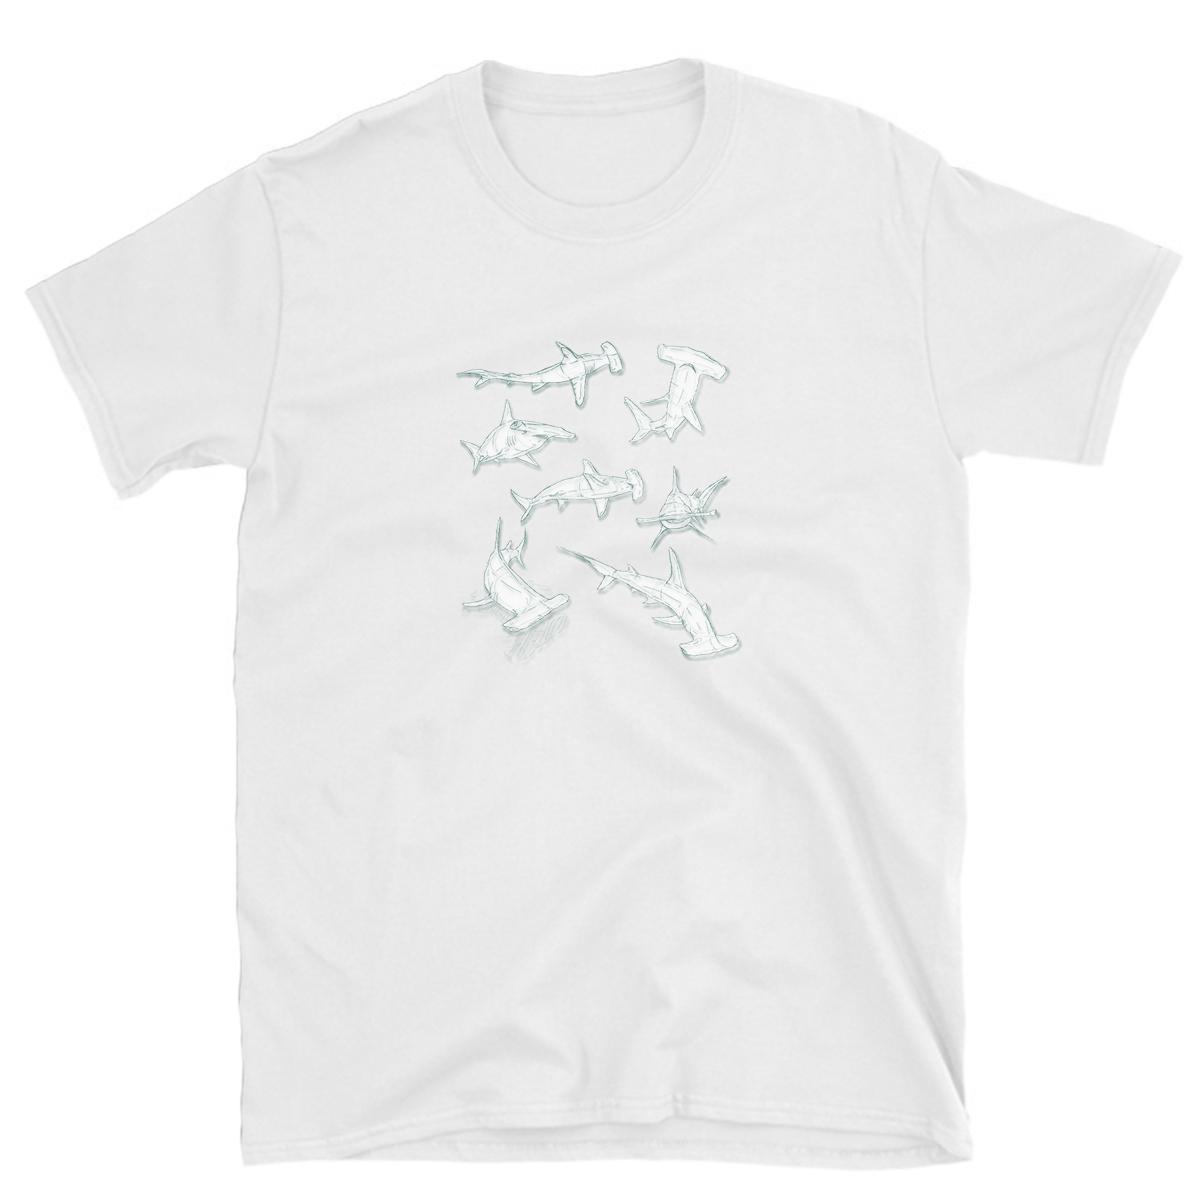 4eab34e6 tshirt hammerhead shark lover heart sharks ocean t-shirt